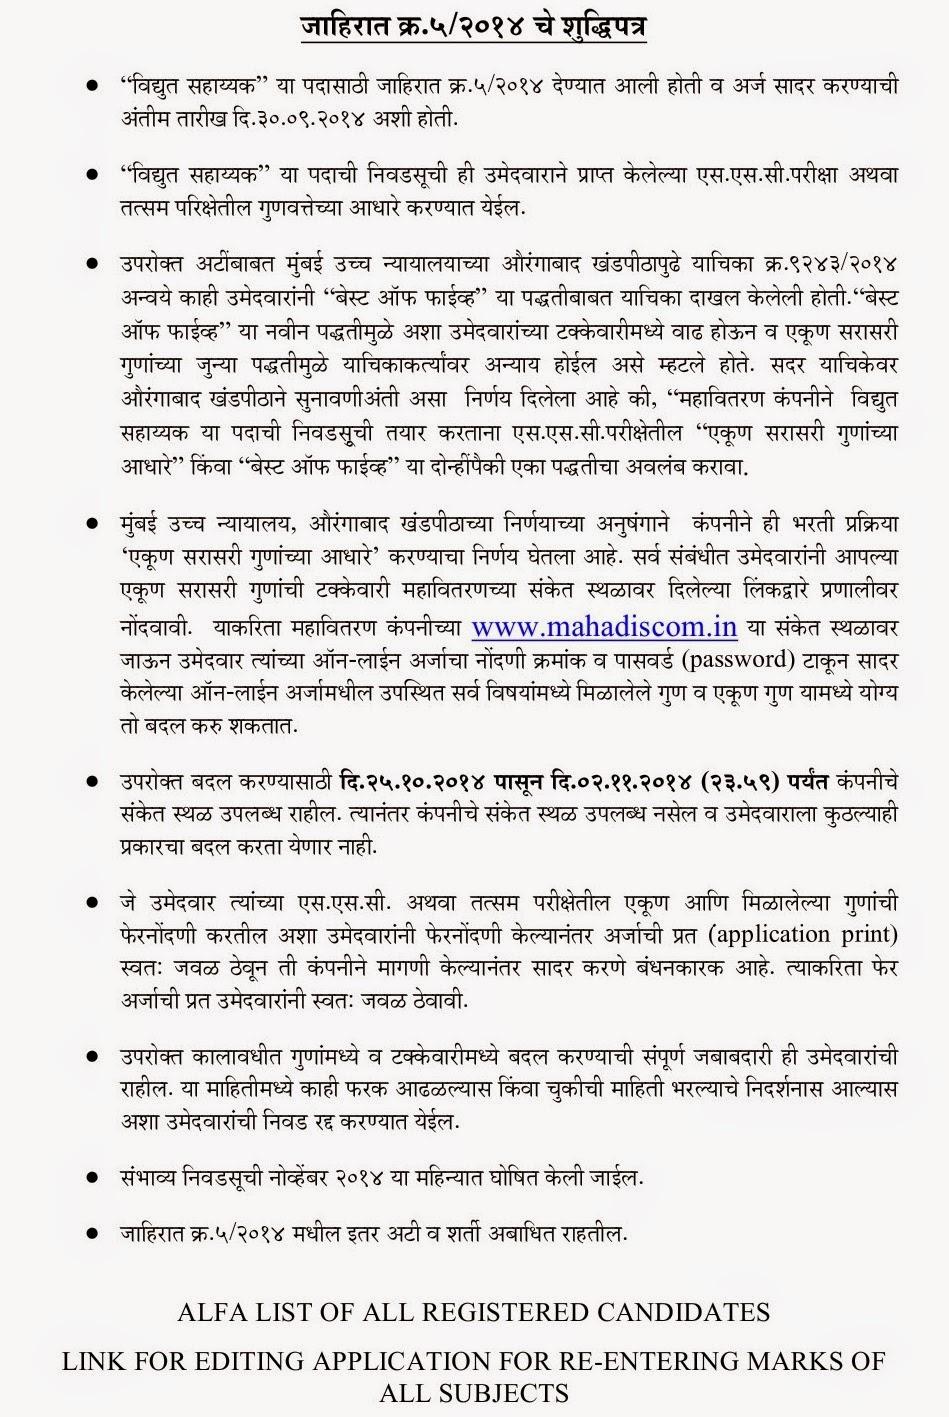 Mahadiscom Vidyut Sahayak Recruitment 2014 Edit Link, Enter SSC Marks Details & Editing Procedure in Marathi